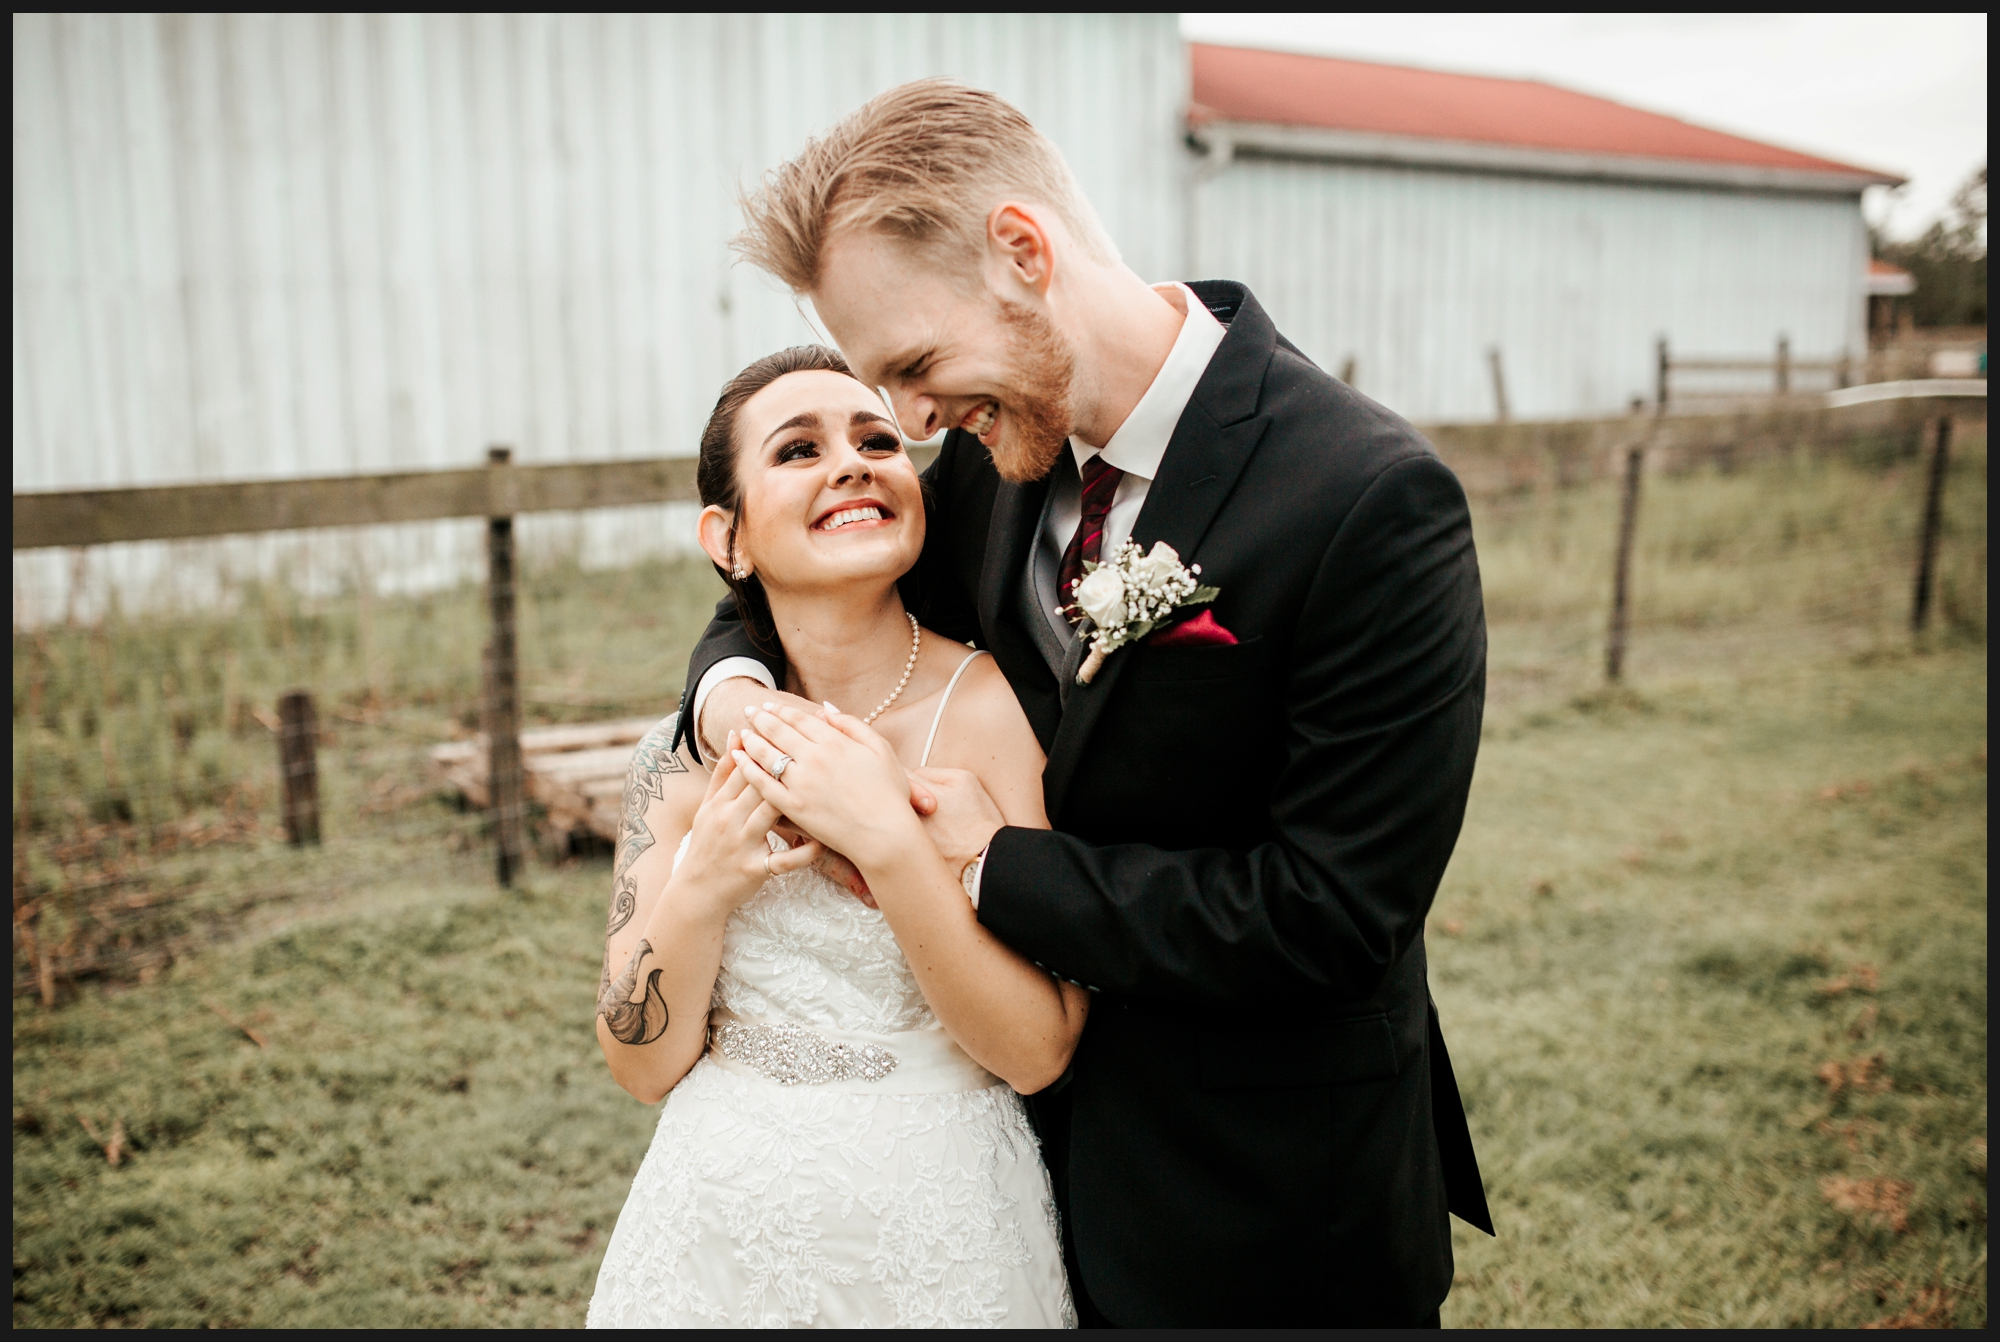 Orlando-Wedding-Photographer-destination-wedding-photographer-florida-wedding-photographer-bohemian-wedding-photographer_0363.jpg